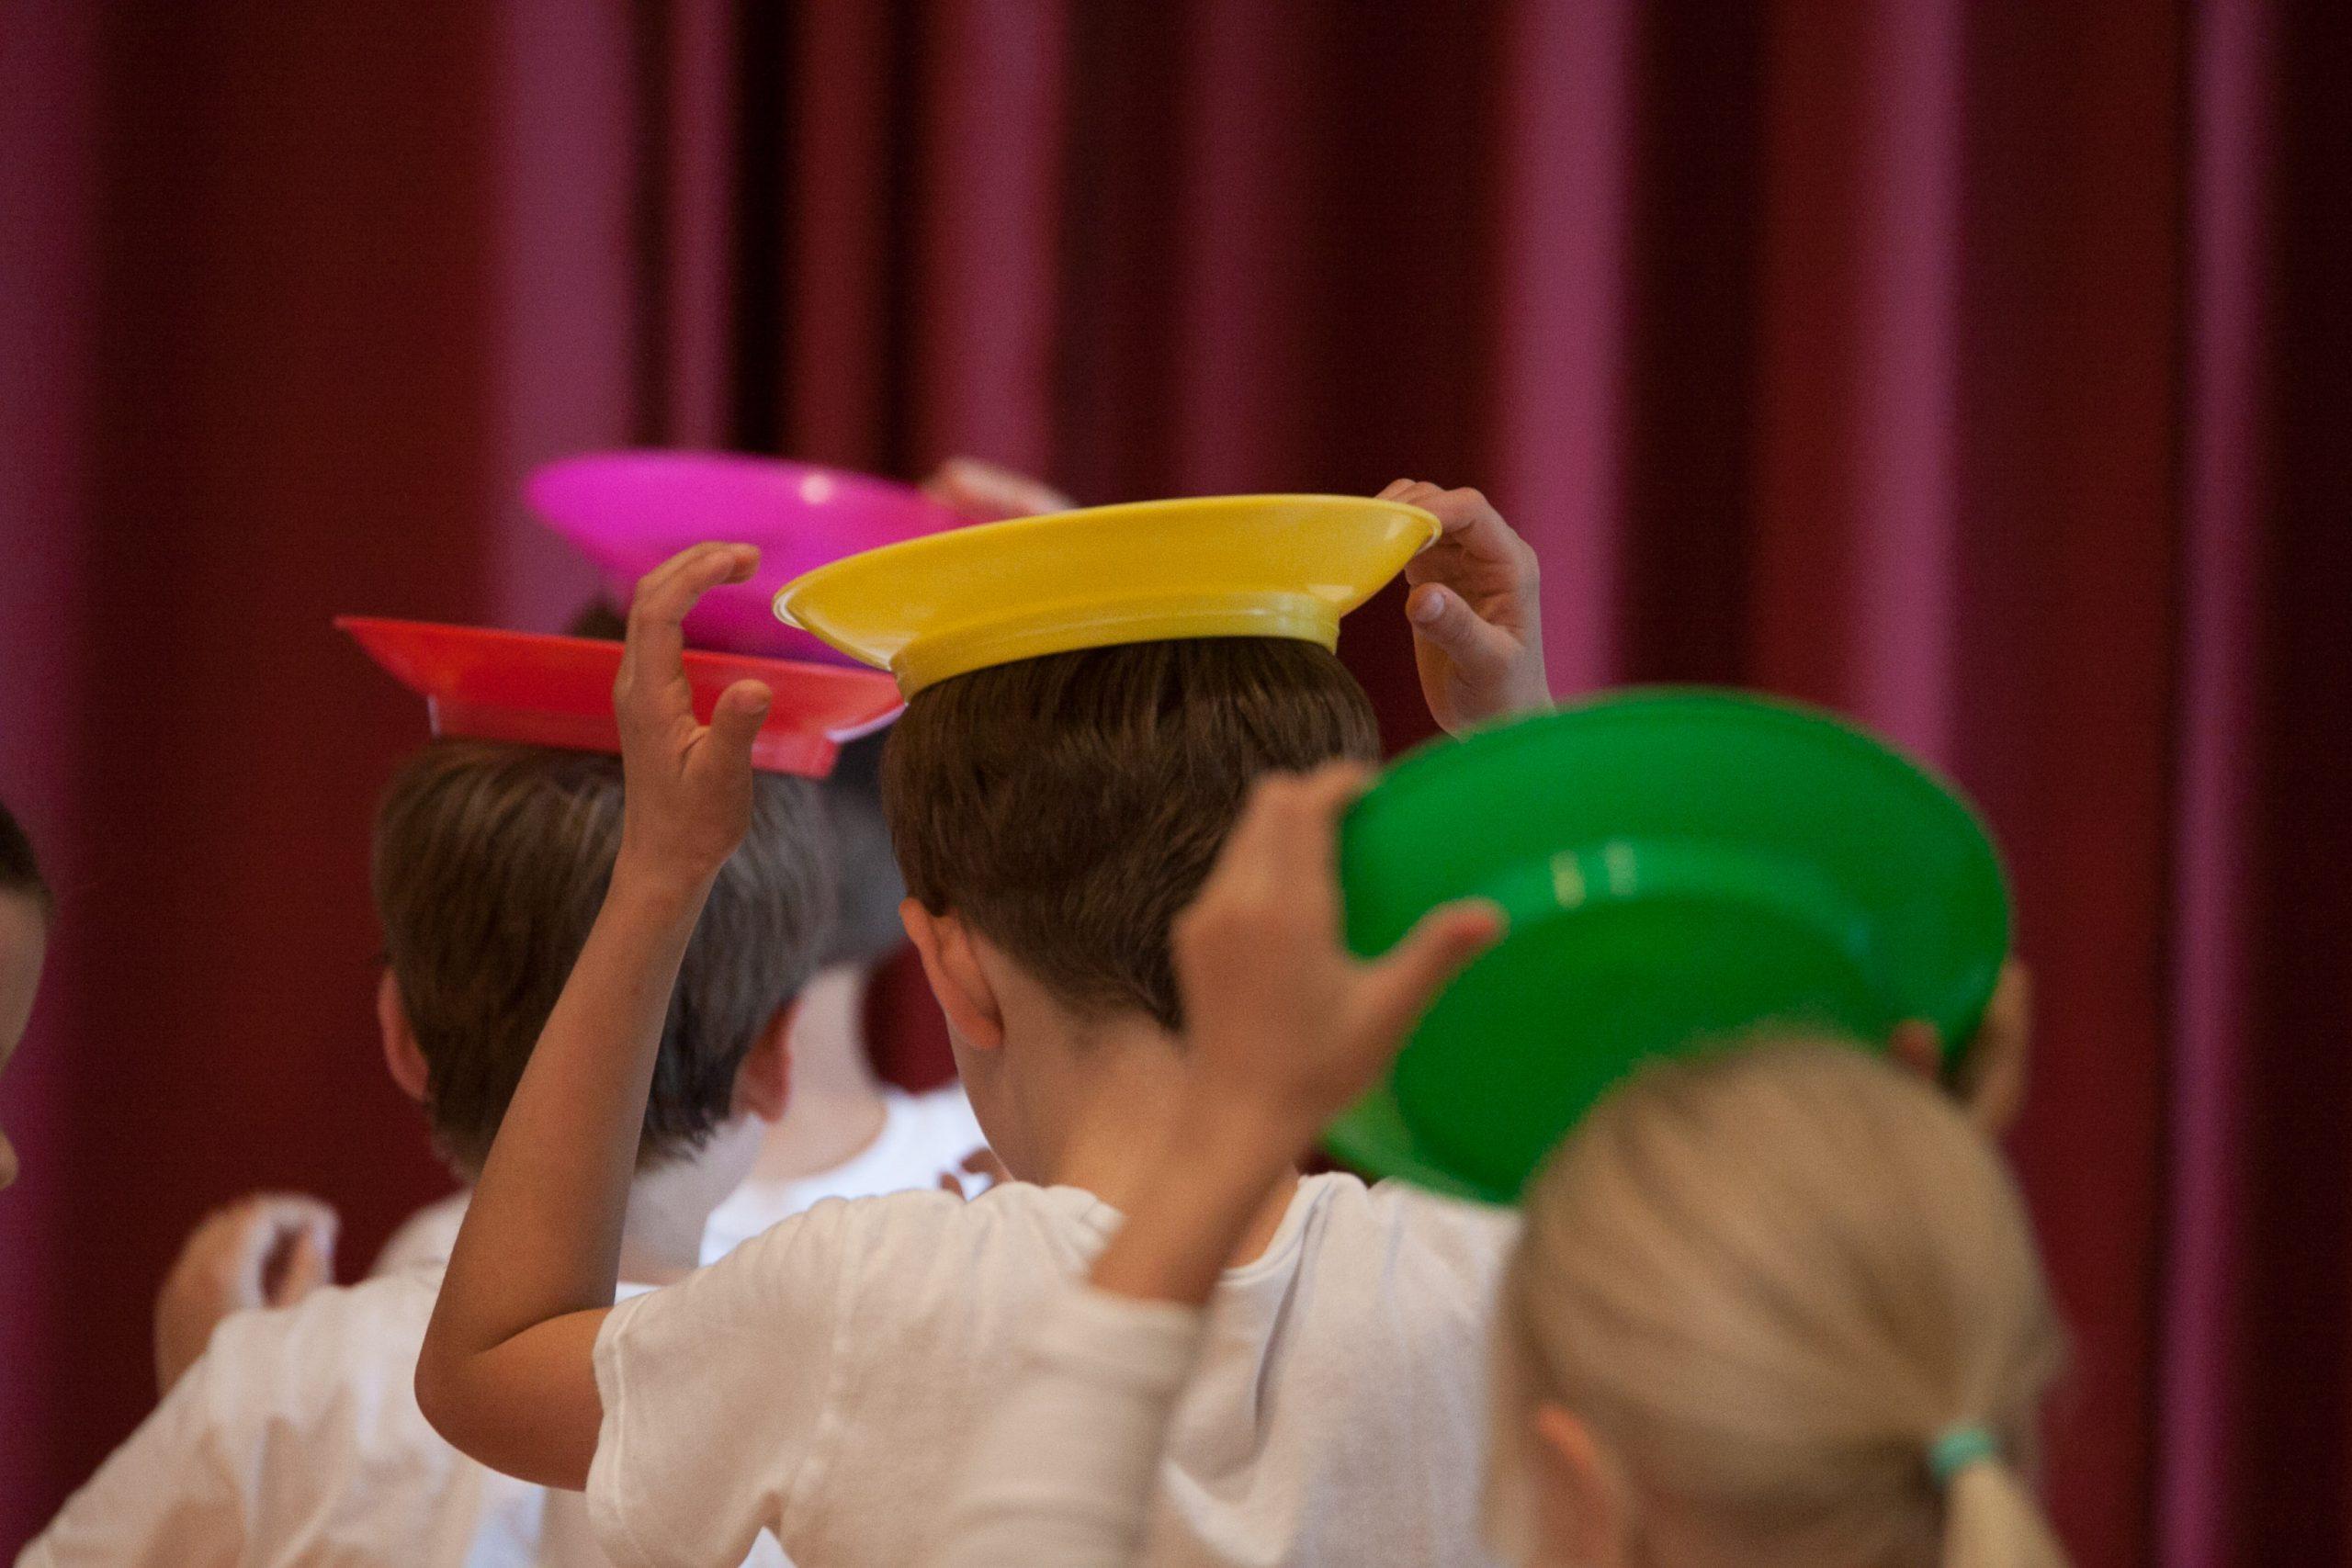 jugendkulturjahr-2020-ratingen-sommerspecial-zirkus-konfetti